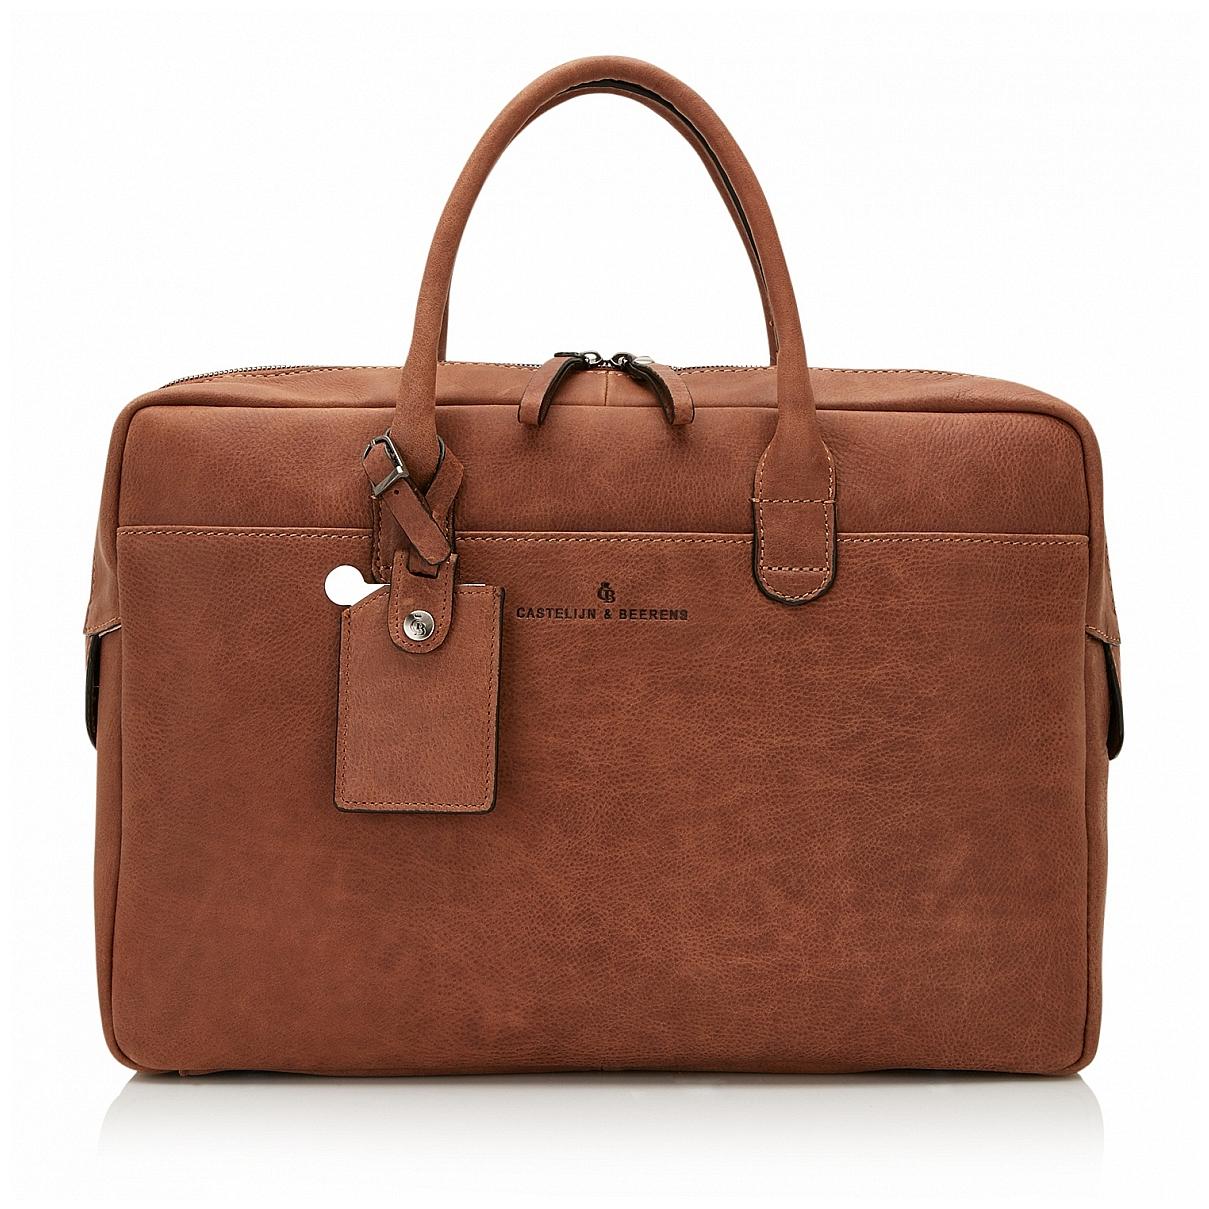 Castelijn & Beerens Kožená taška na notebook a tablet 729478 CO koňak